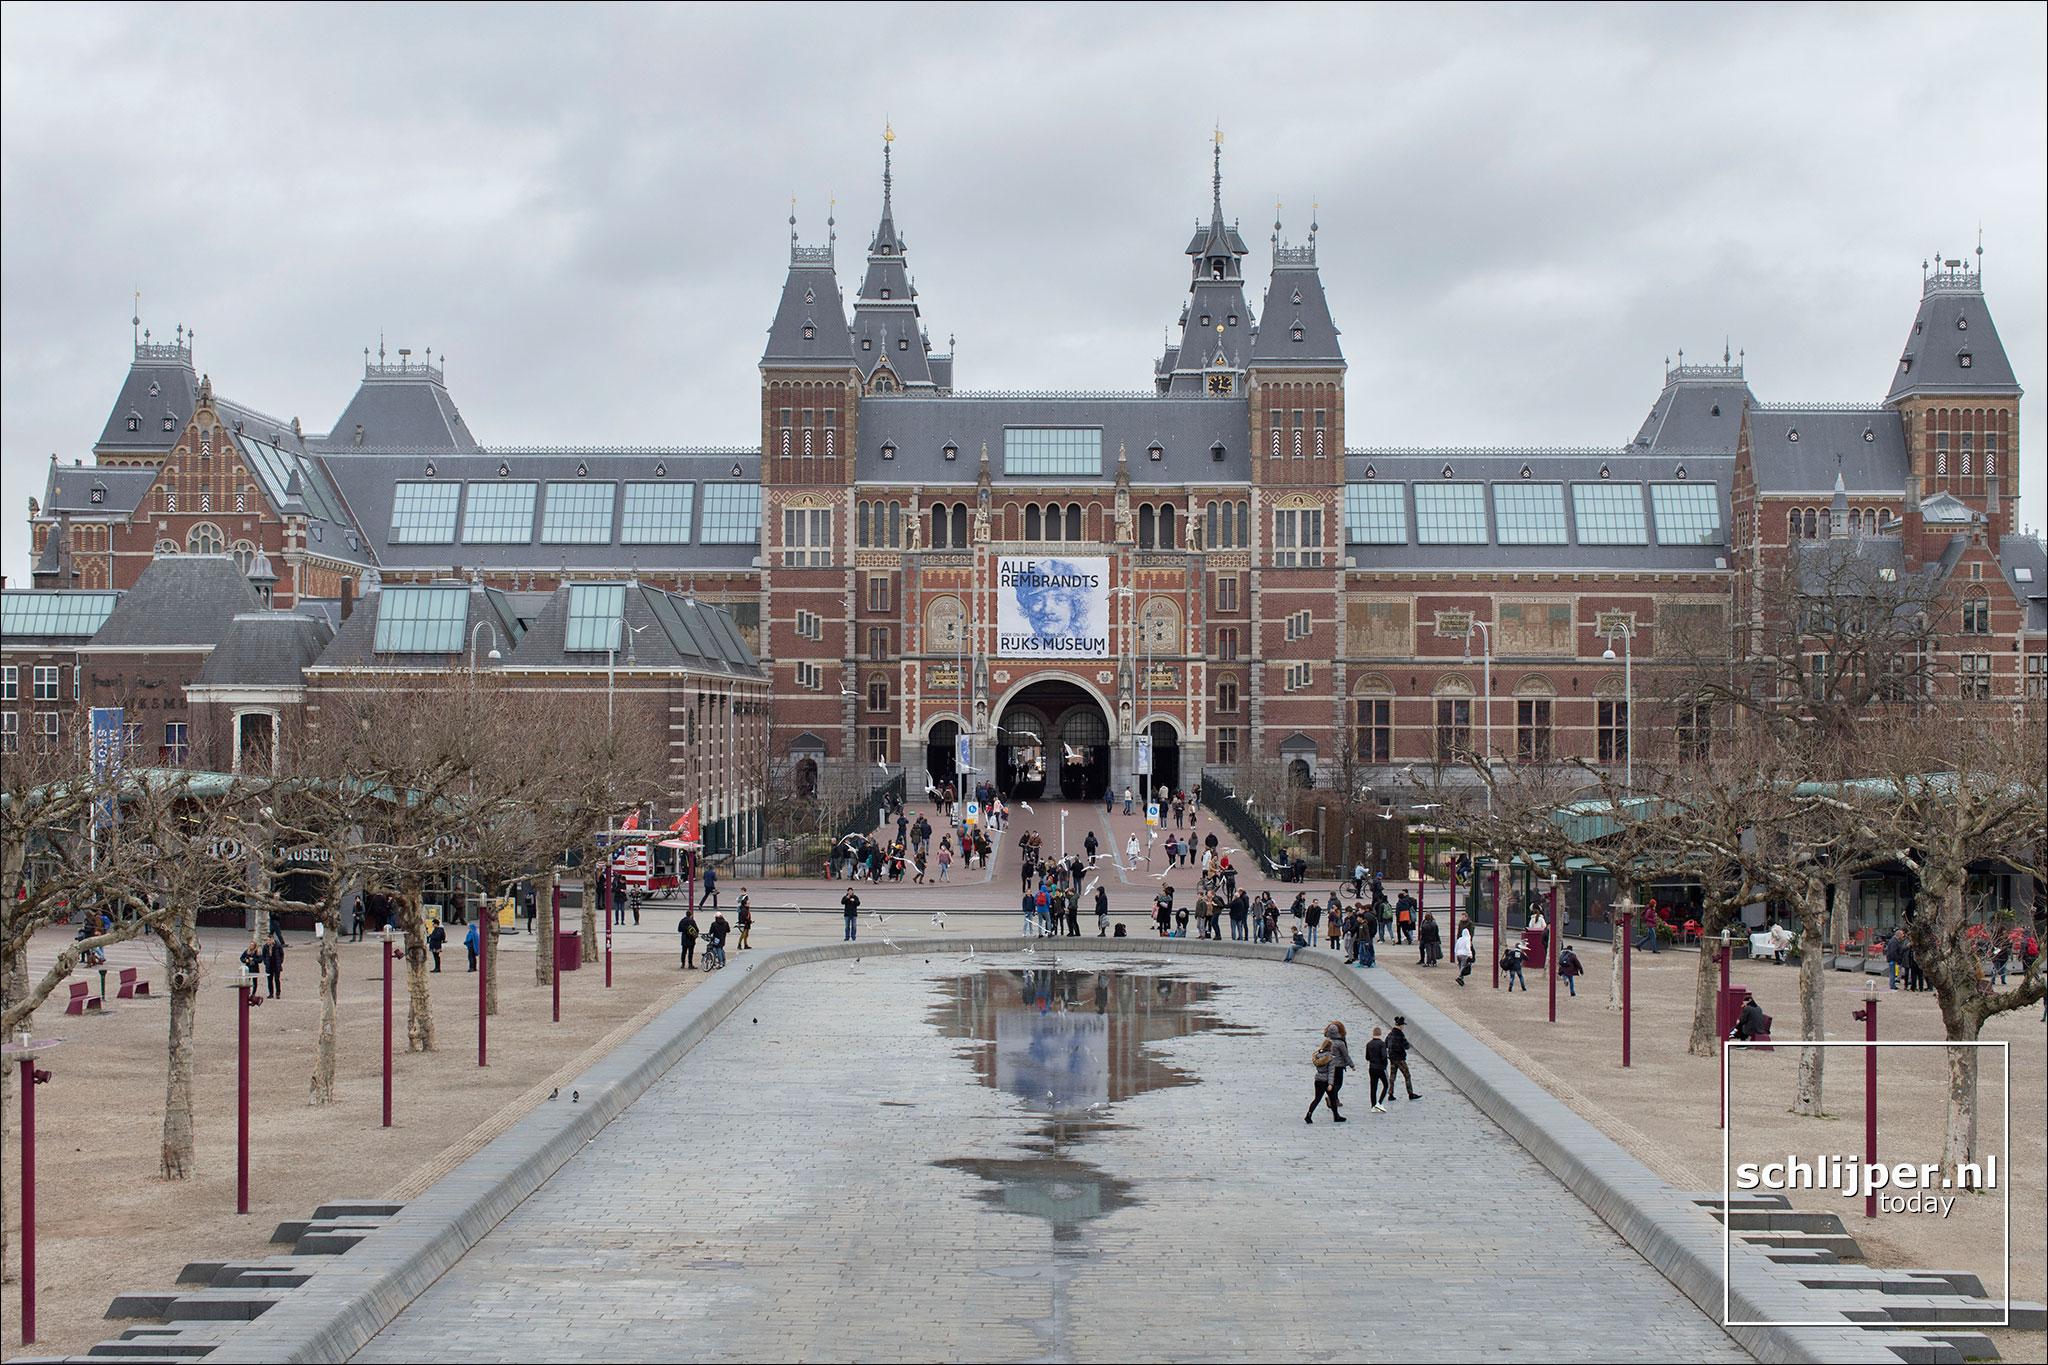 The Netherlands, Amsterdam, 19 februari 2019